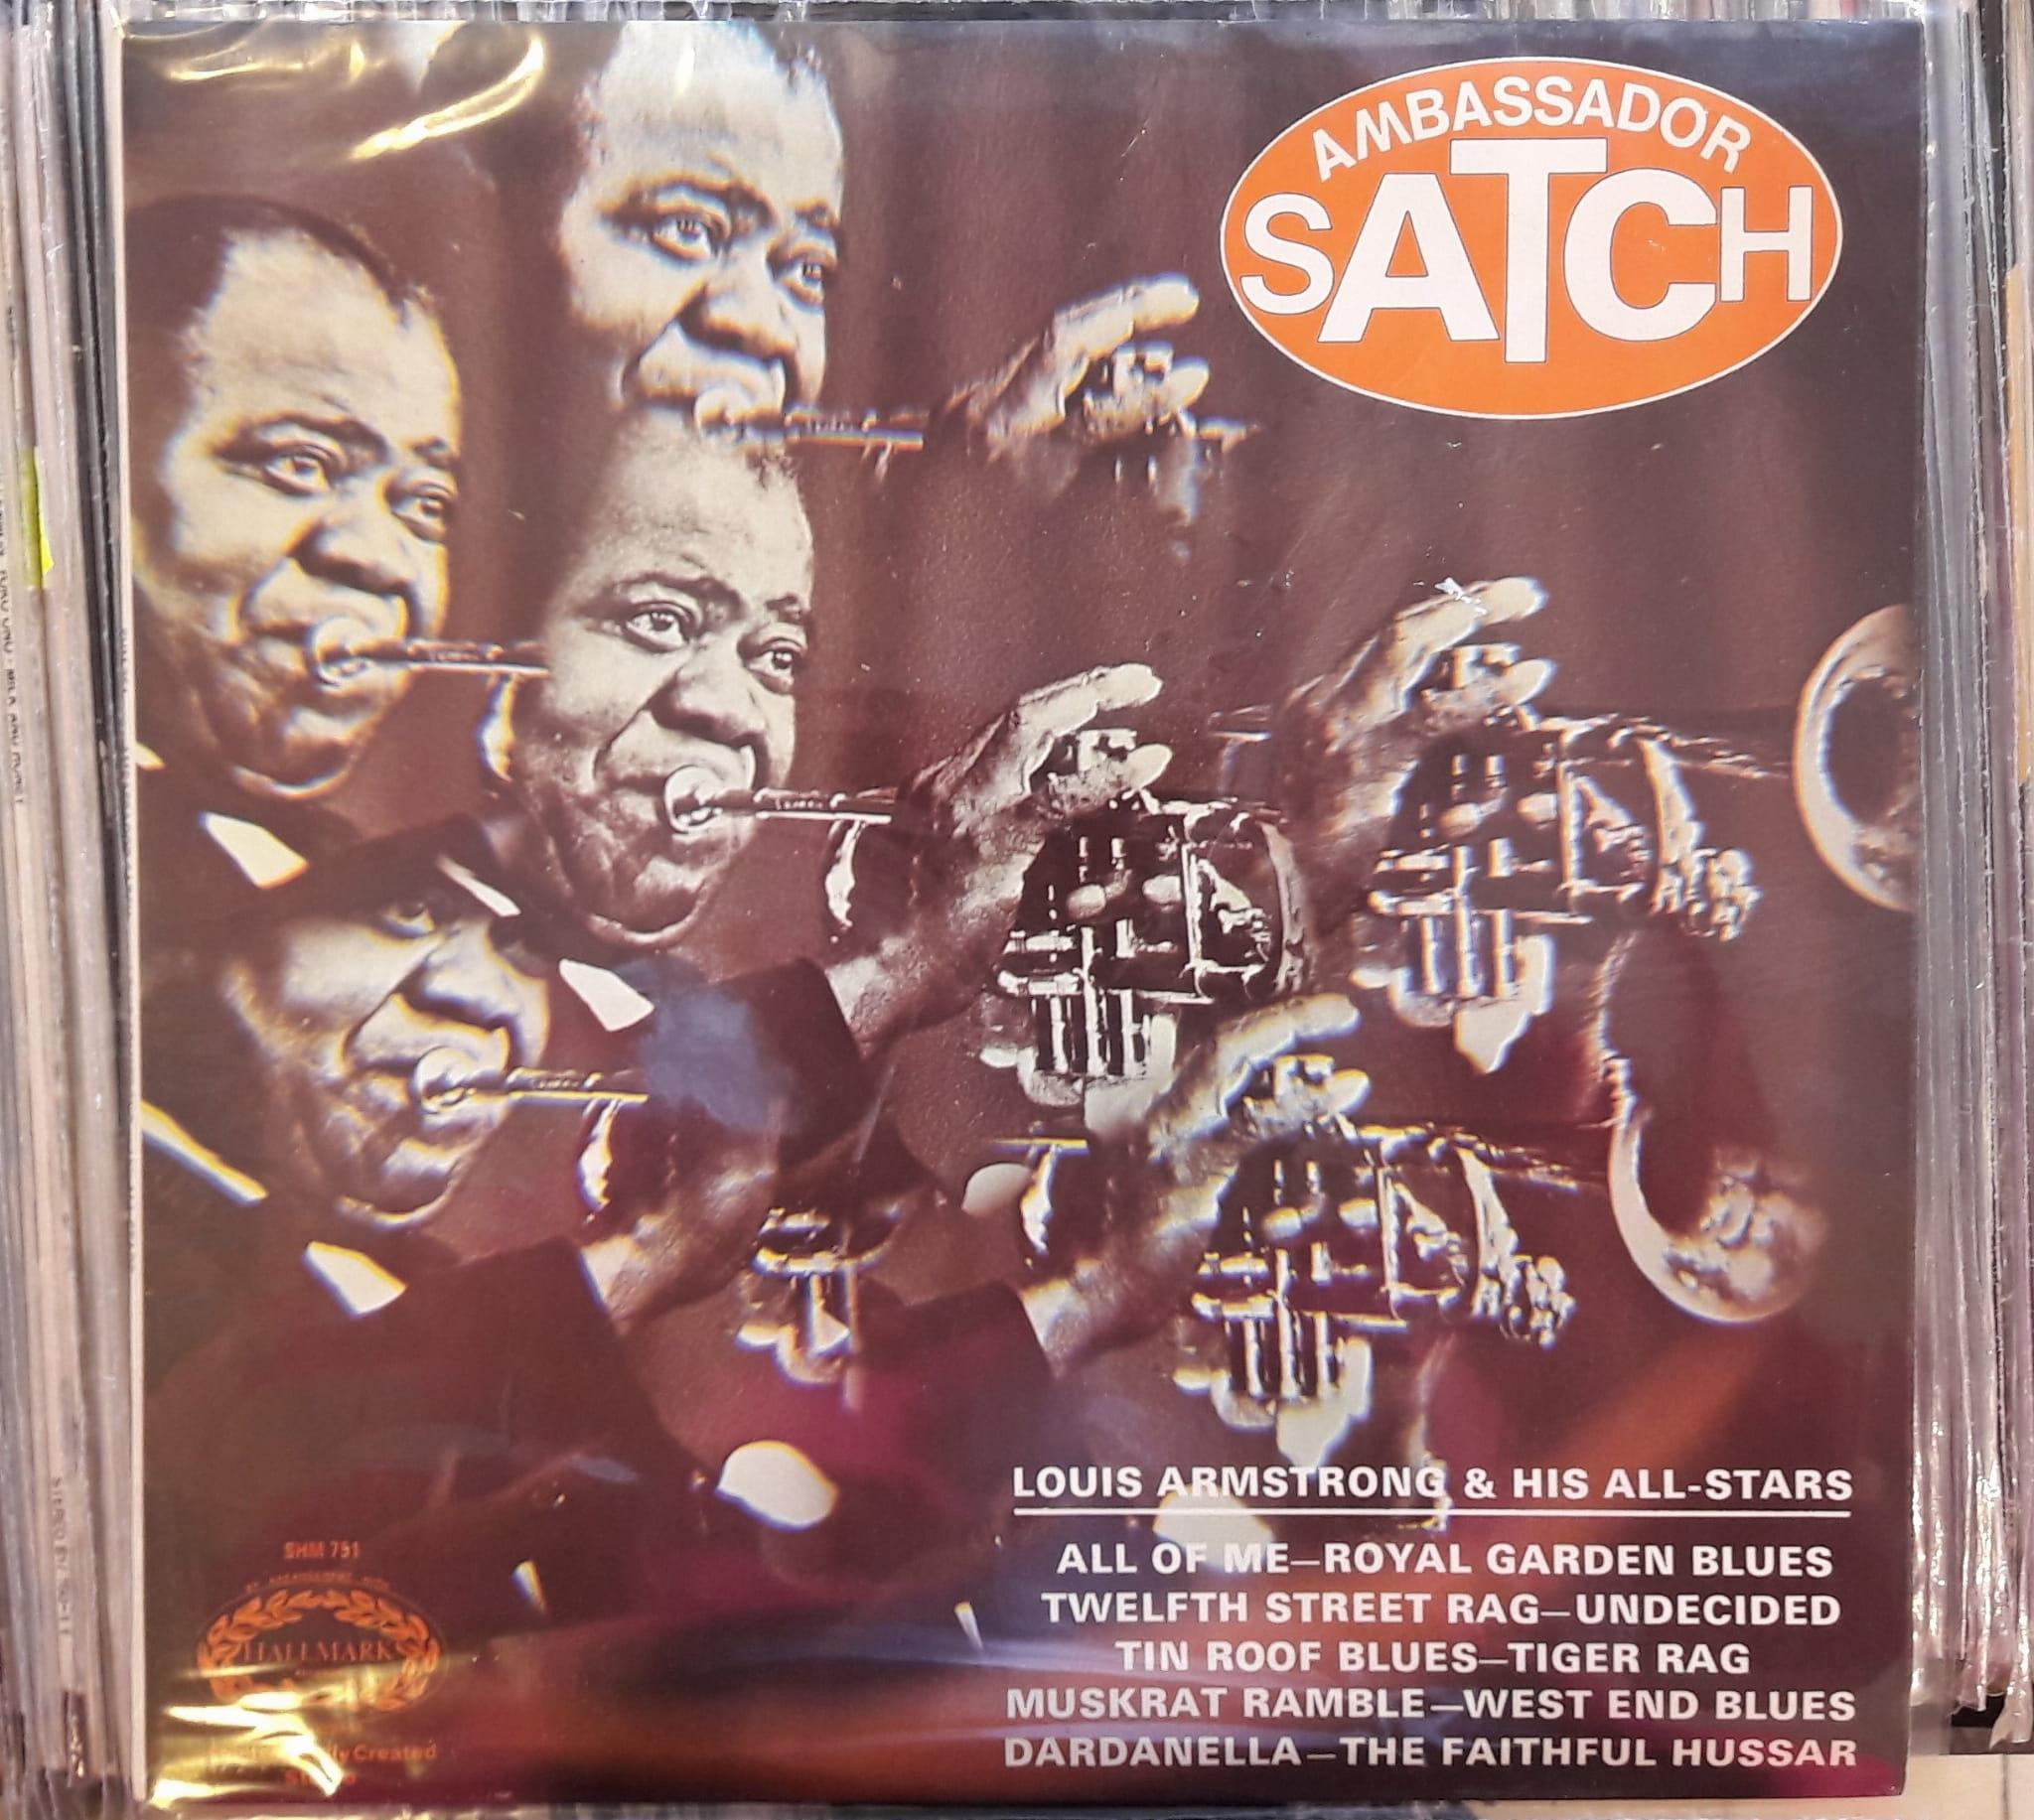 Louis Armstrong & His All-Stars– Ambassador Satch ,SHM 751 Vinyl, LP, Album